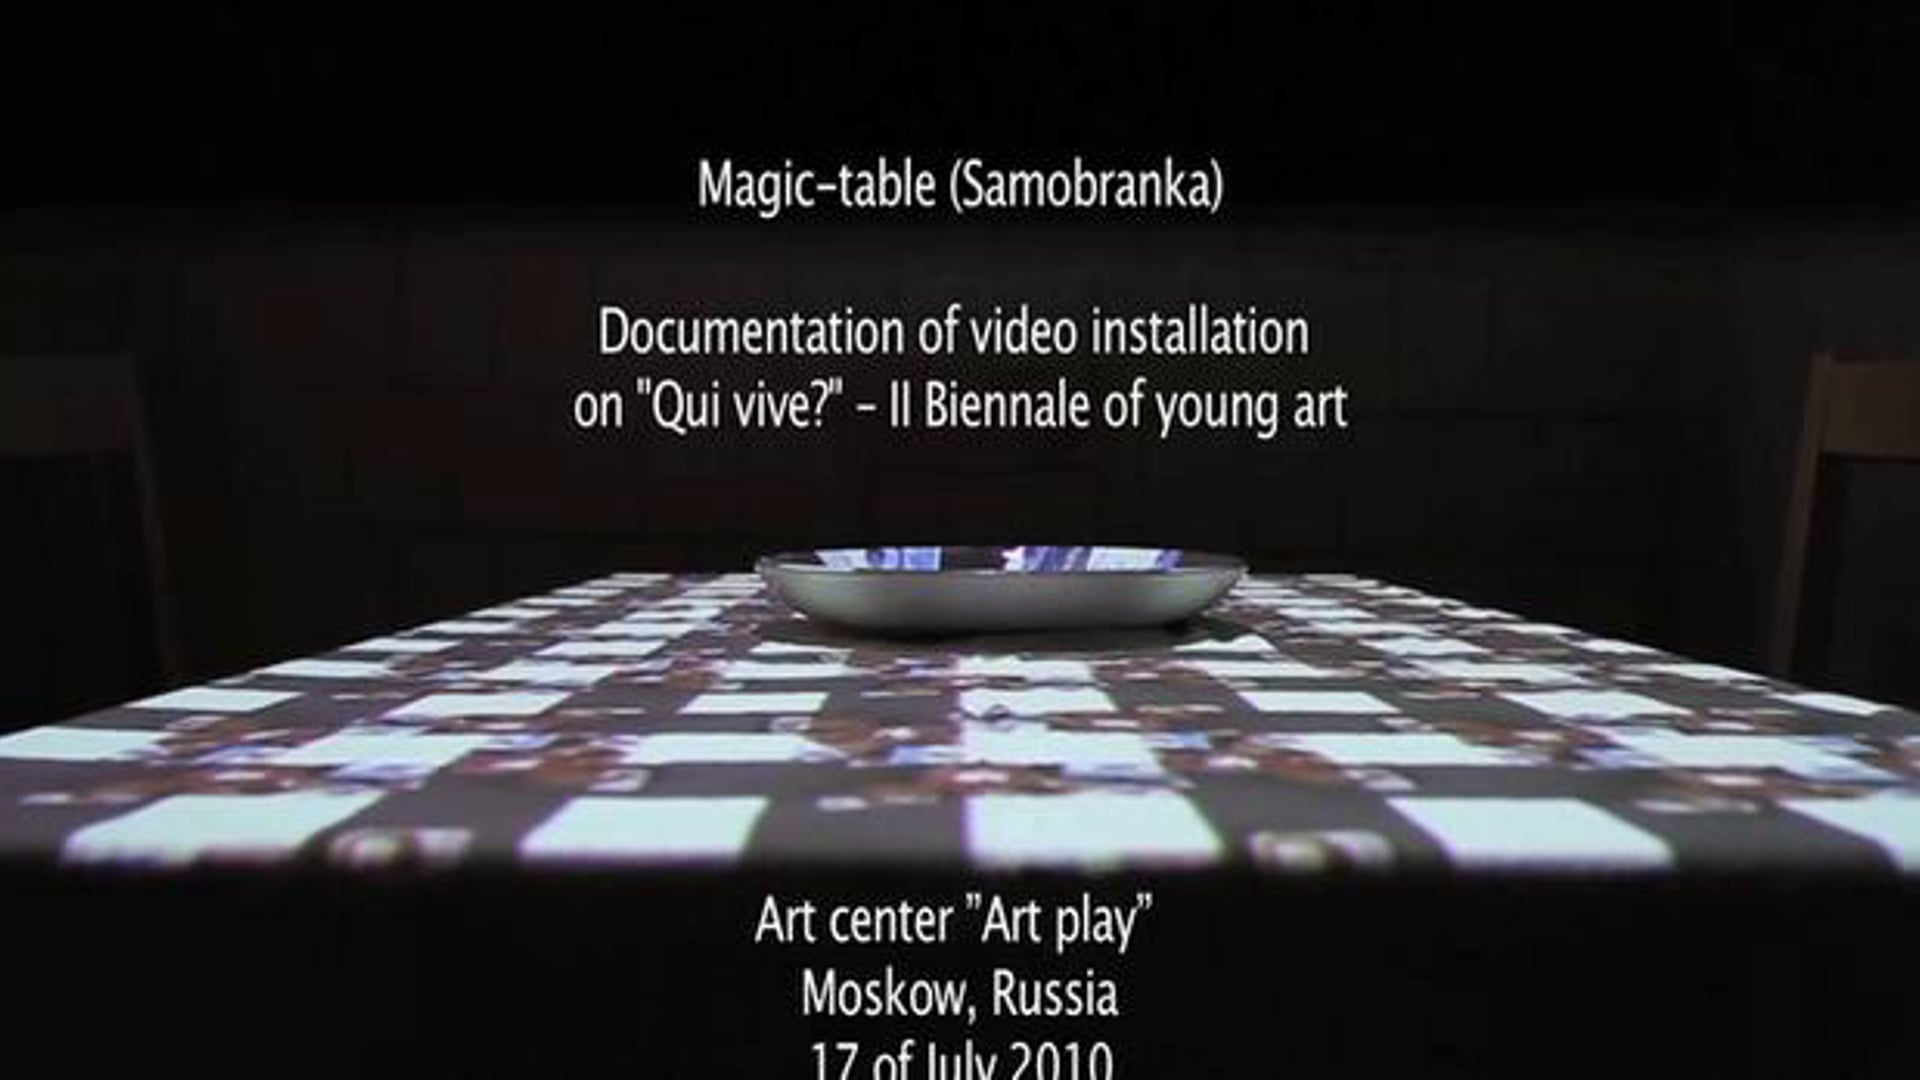 Samobranka (Magic table-cloth)